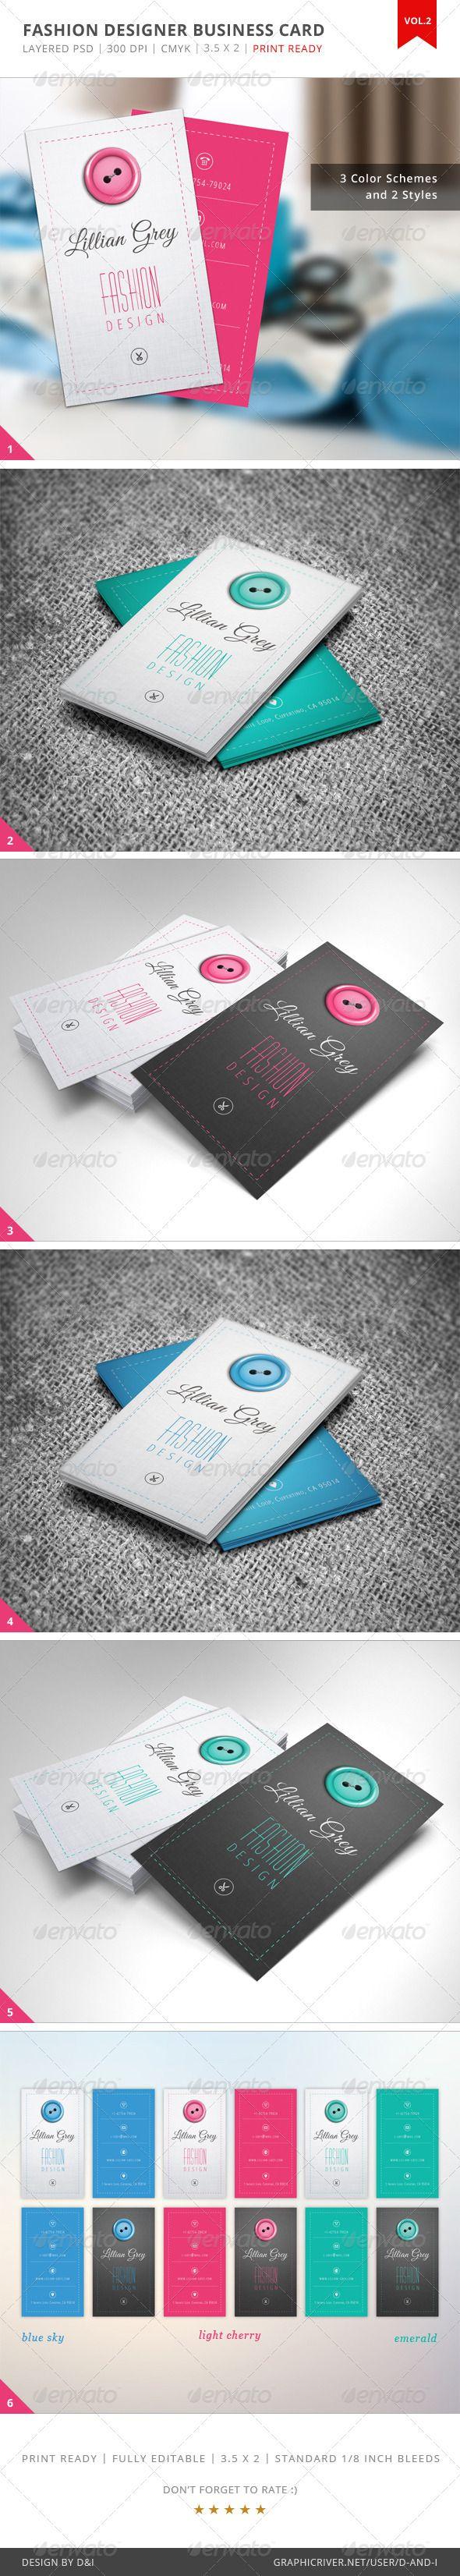 Fashion Designer Business Card - Vol.2 - Creative Business Cards